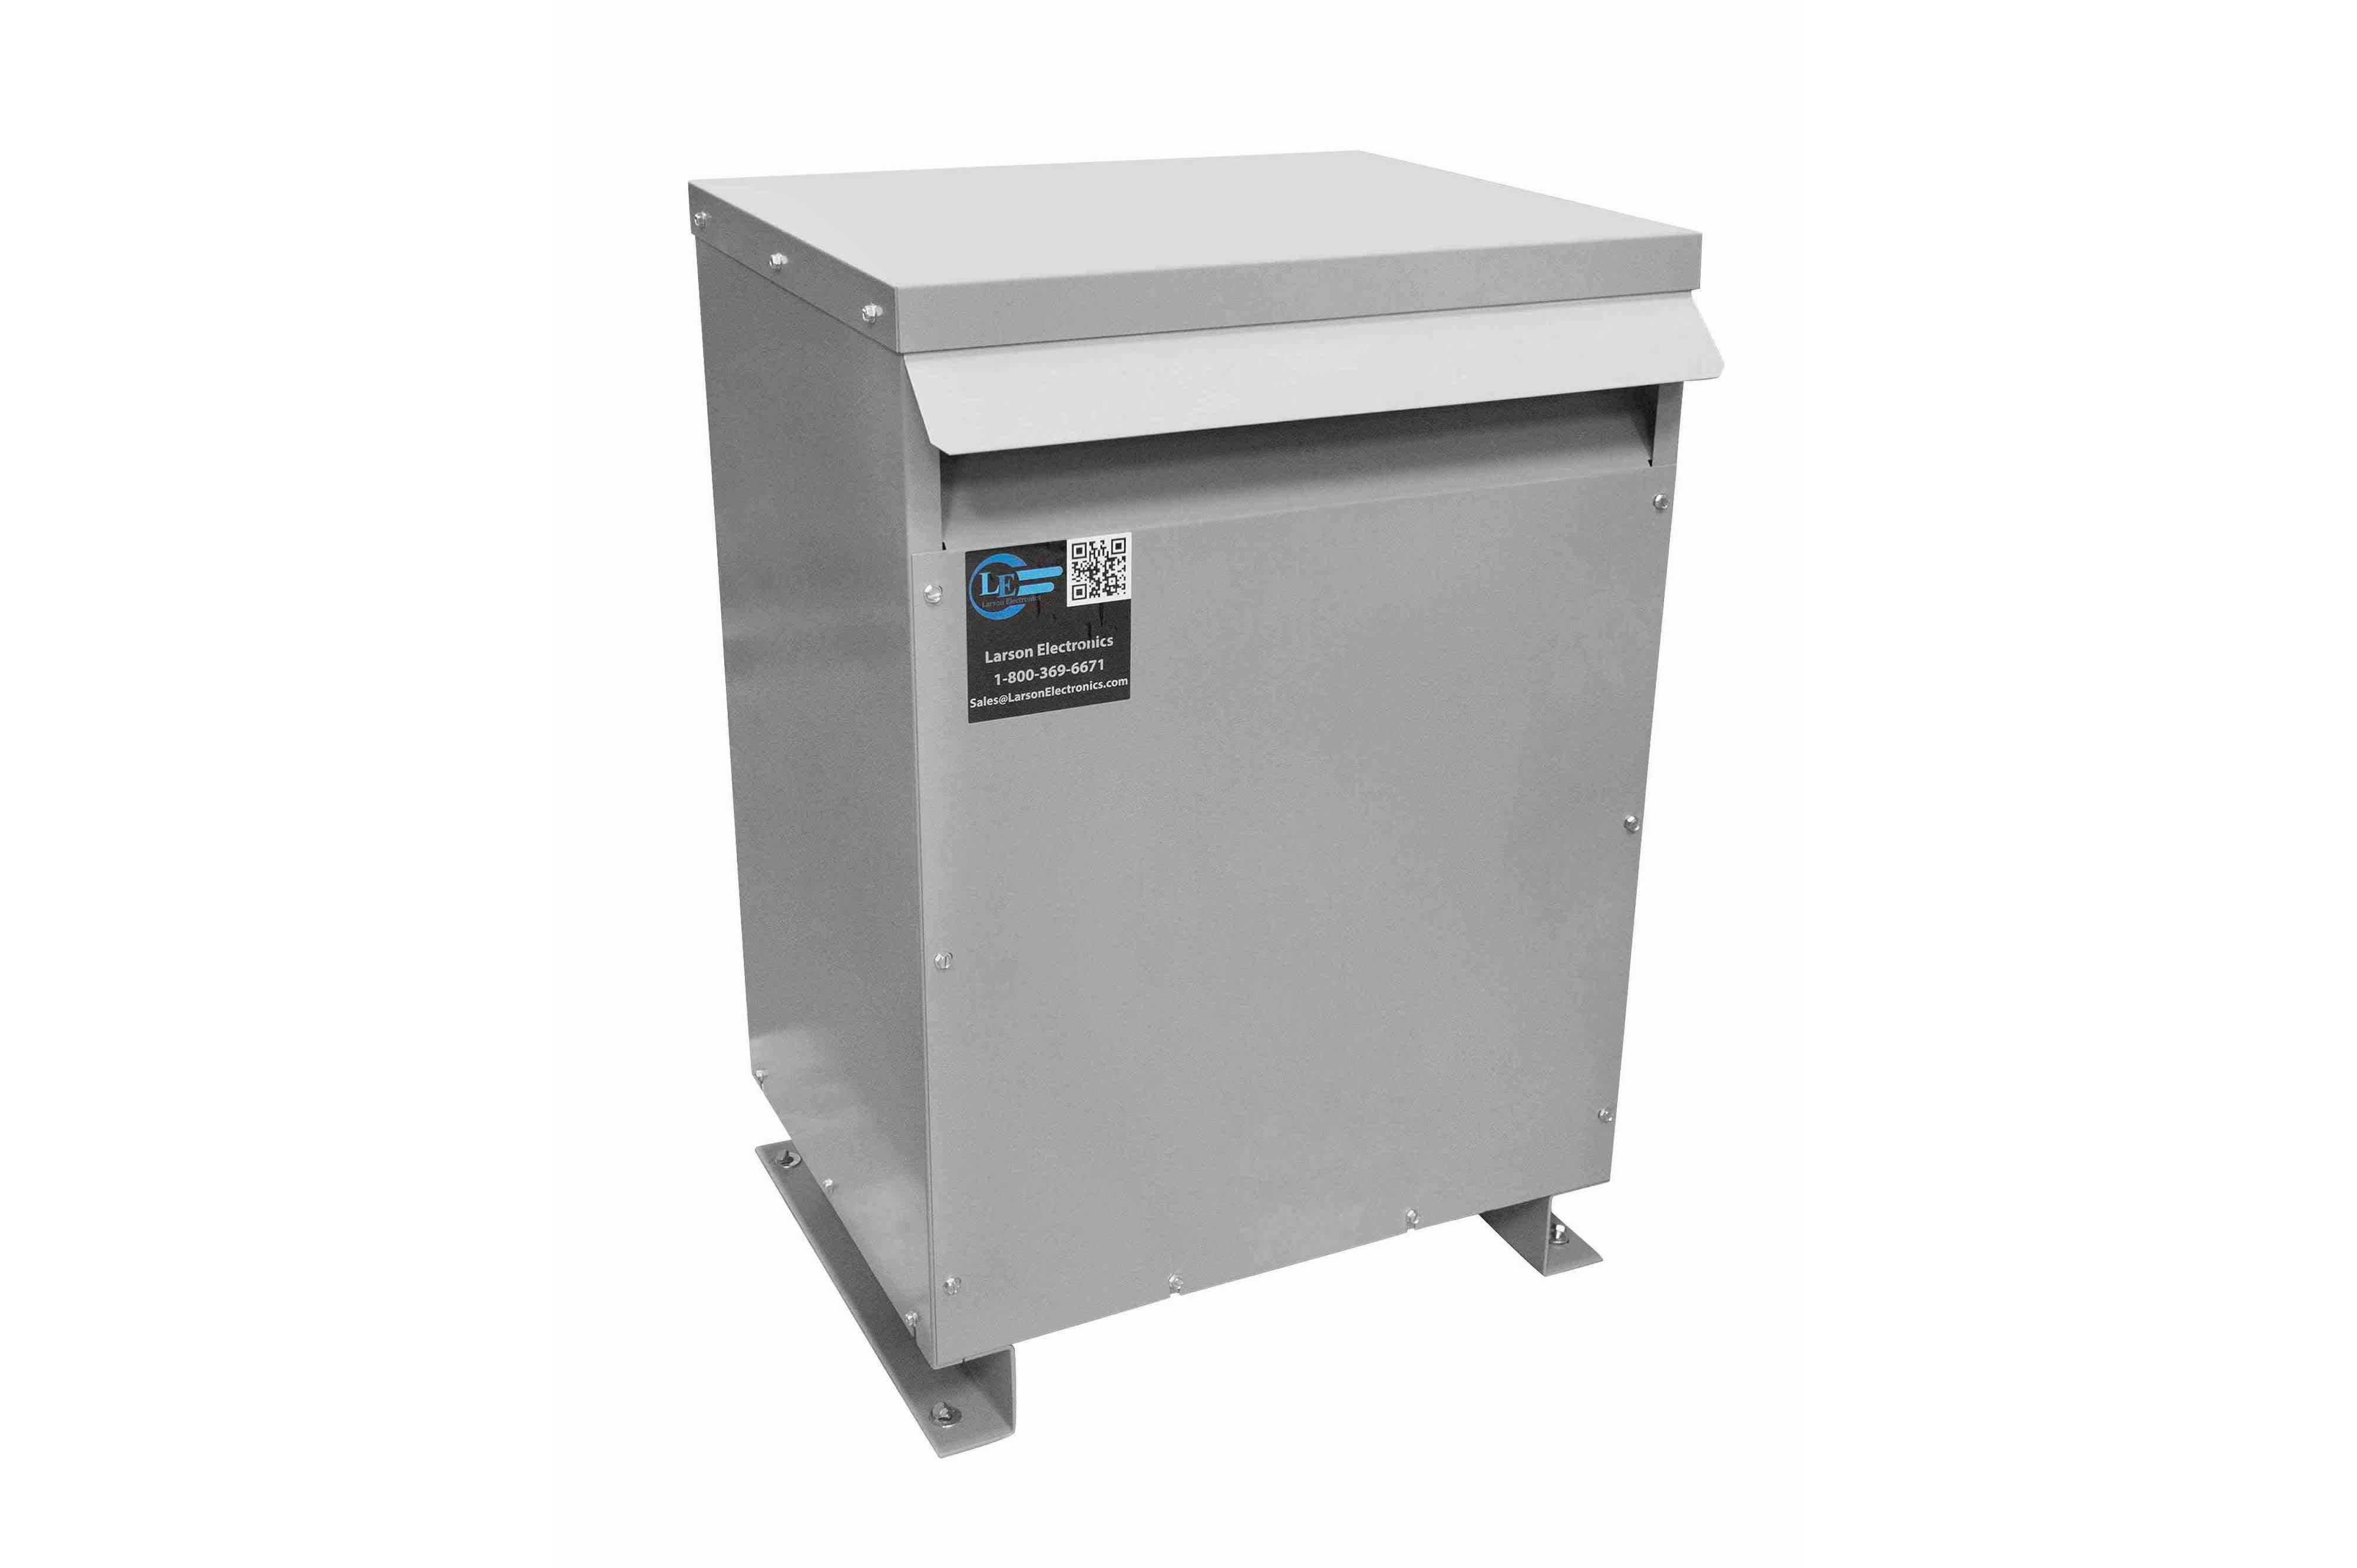 750 kVA 3PH DOE Transformer, 460V Delta Primary, 400Y/231 Wye-N Secondary, N3R, Ventilated, 60 Hz